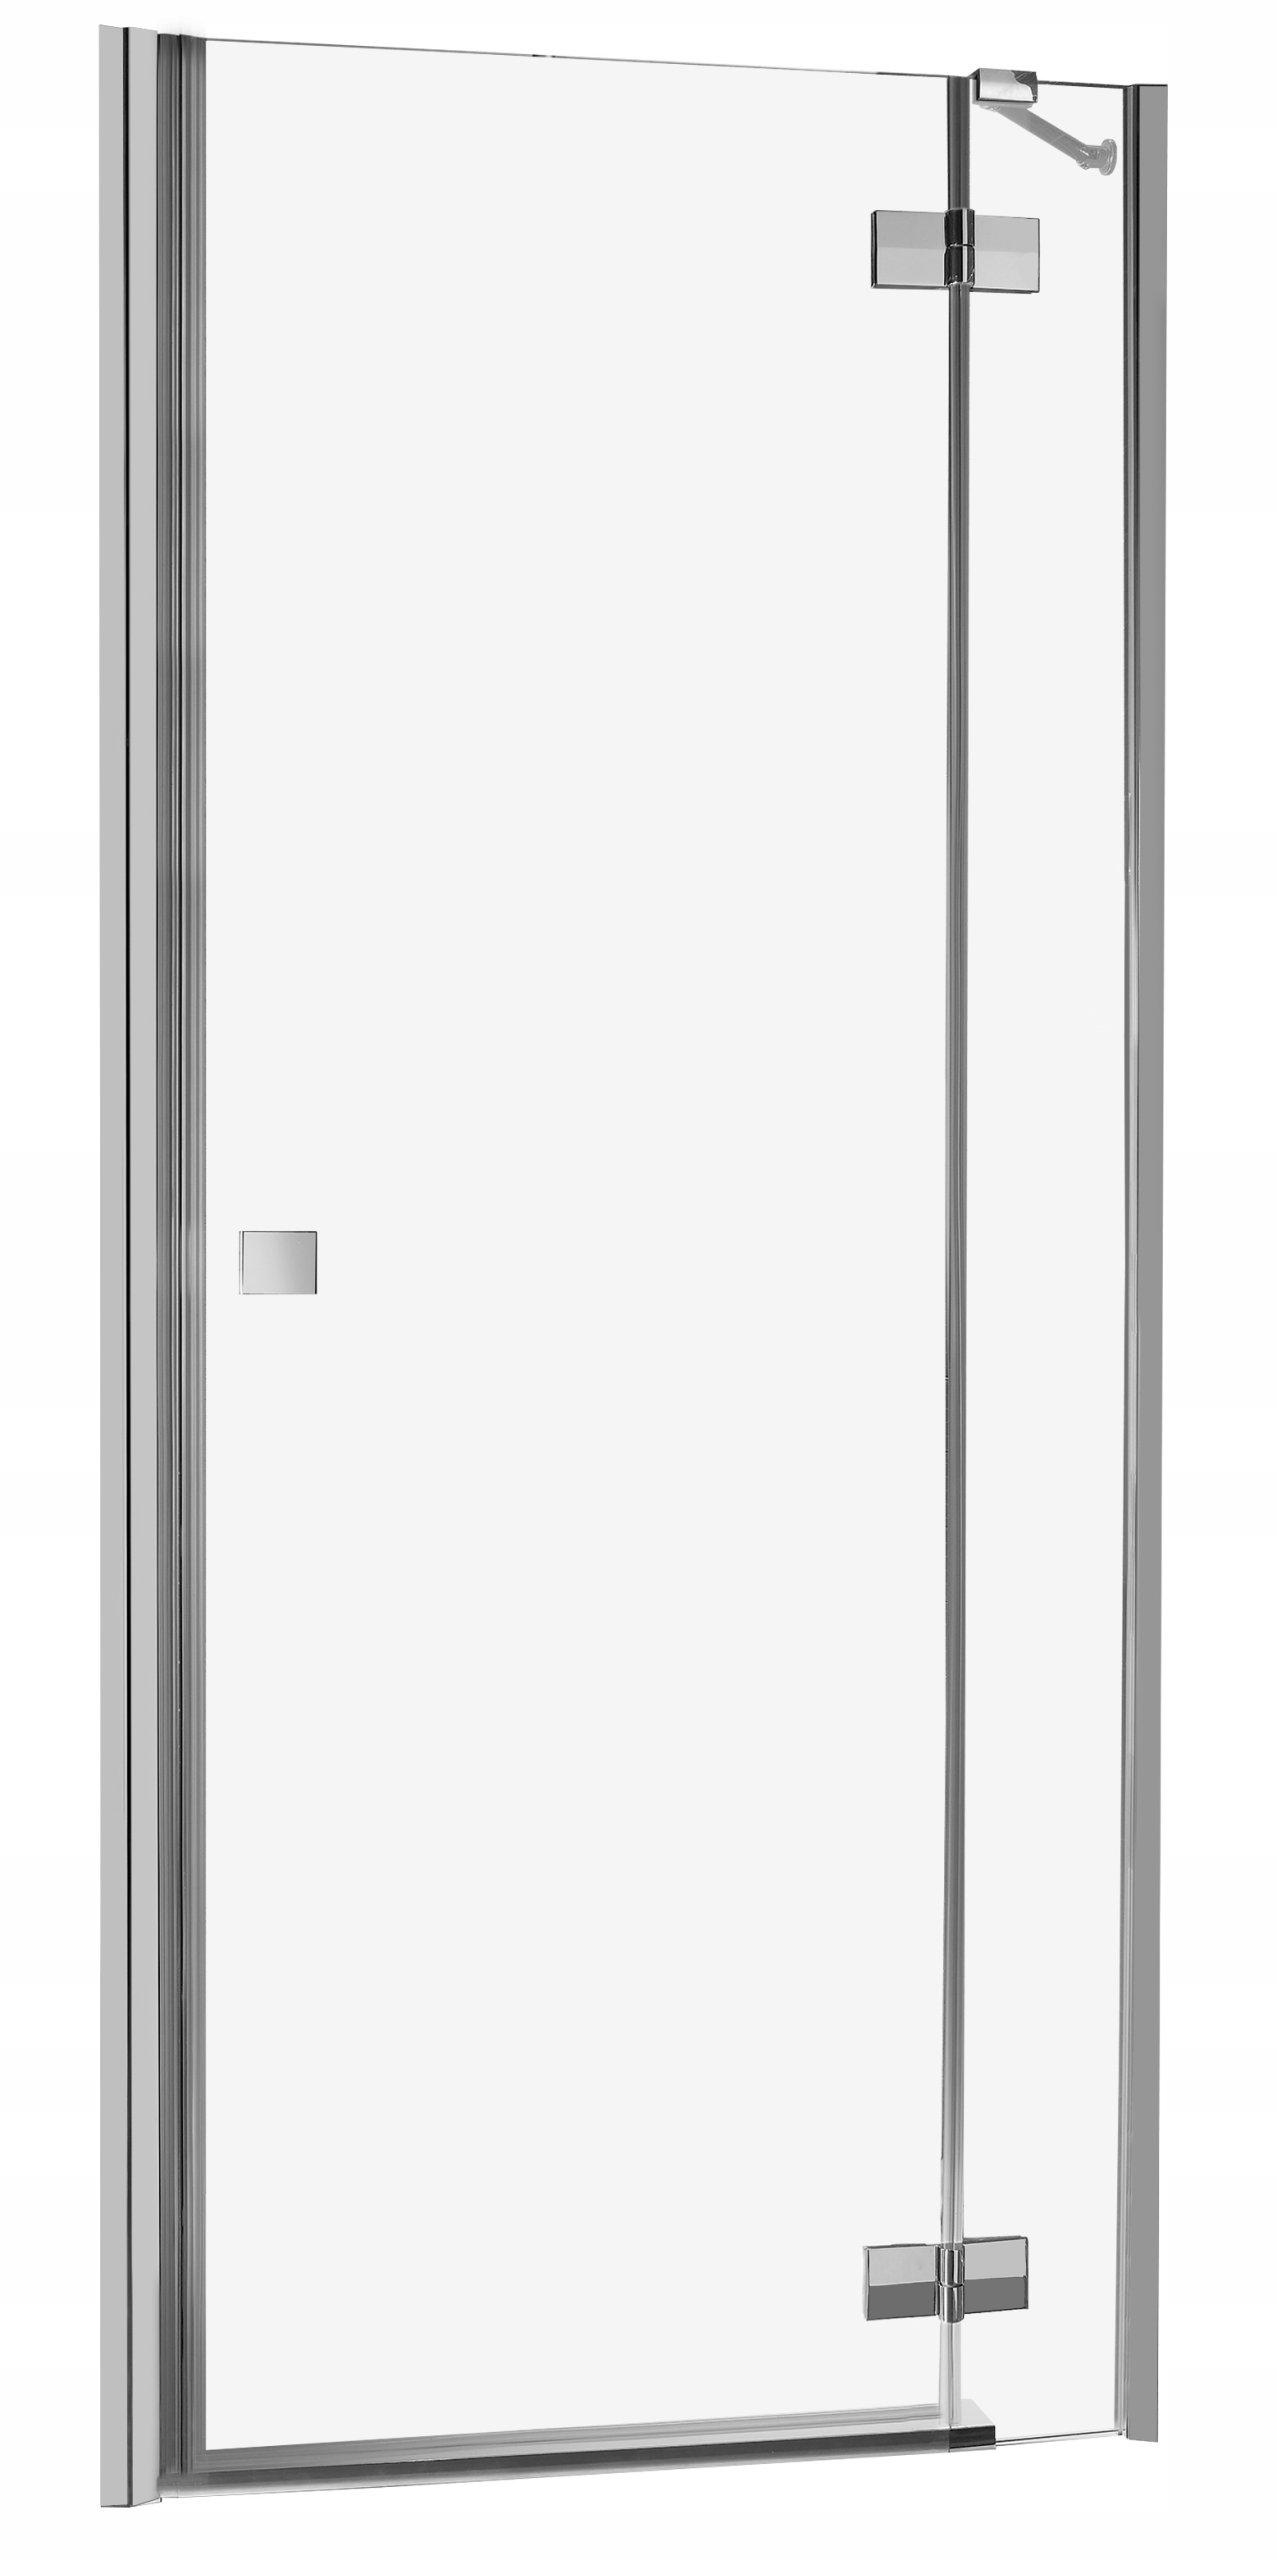 Almatea DWJ 120x195 RADAWAY sprchové dvere